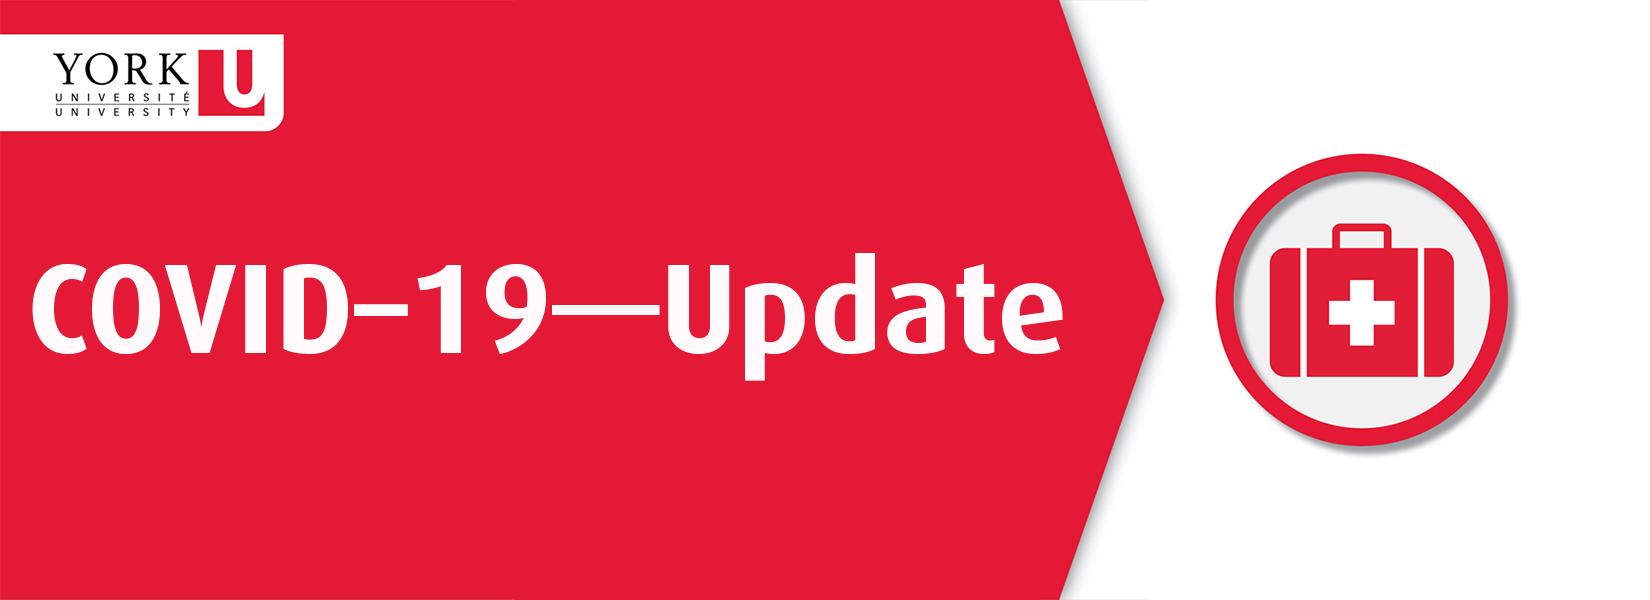 COVID-19 Update graphic